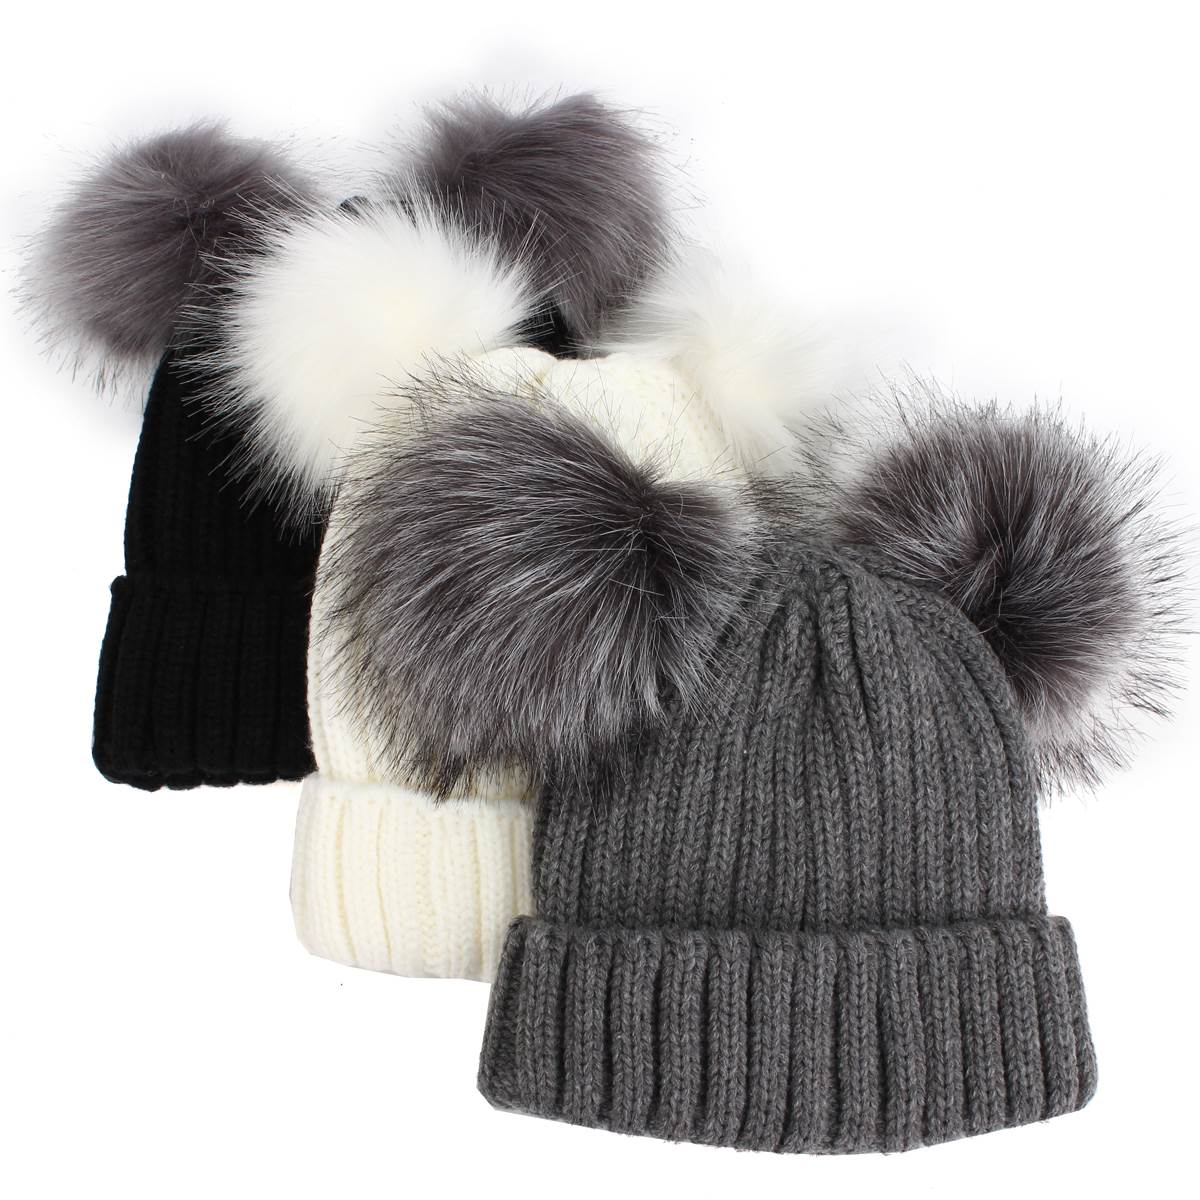 f25a531a6 US $6.52 28% OFF|Furry Hat With Double Pompom Women Winter Warm Knitted  Wool Cotton Hats Bobble Gorros Beanies Bonnet Ear Warmer Female Ski Cap-in  ...